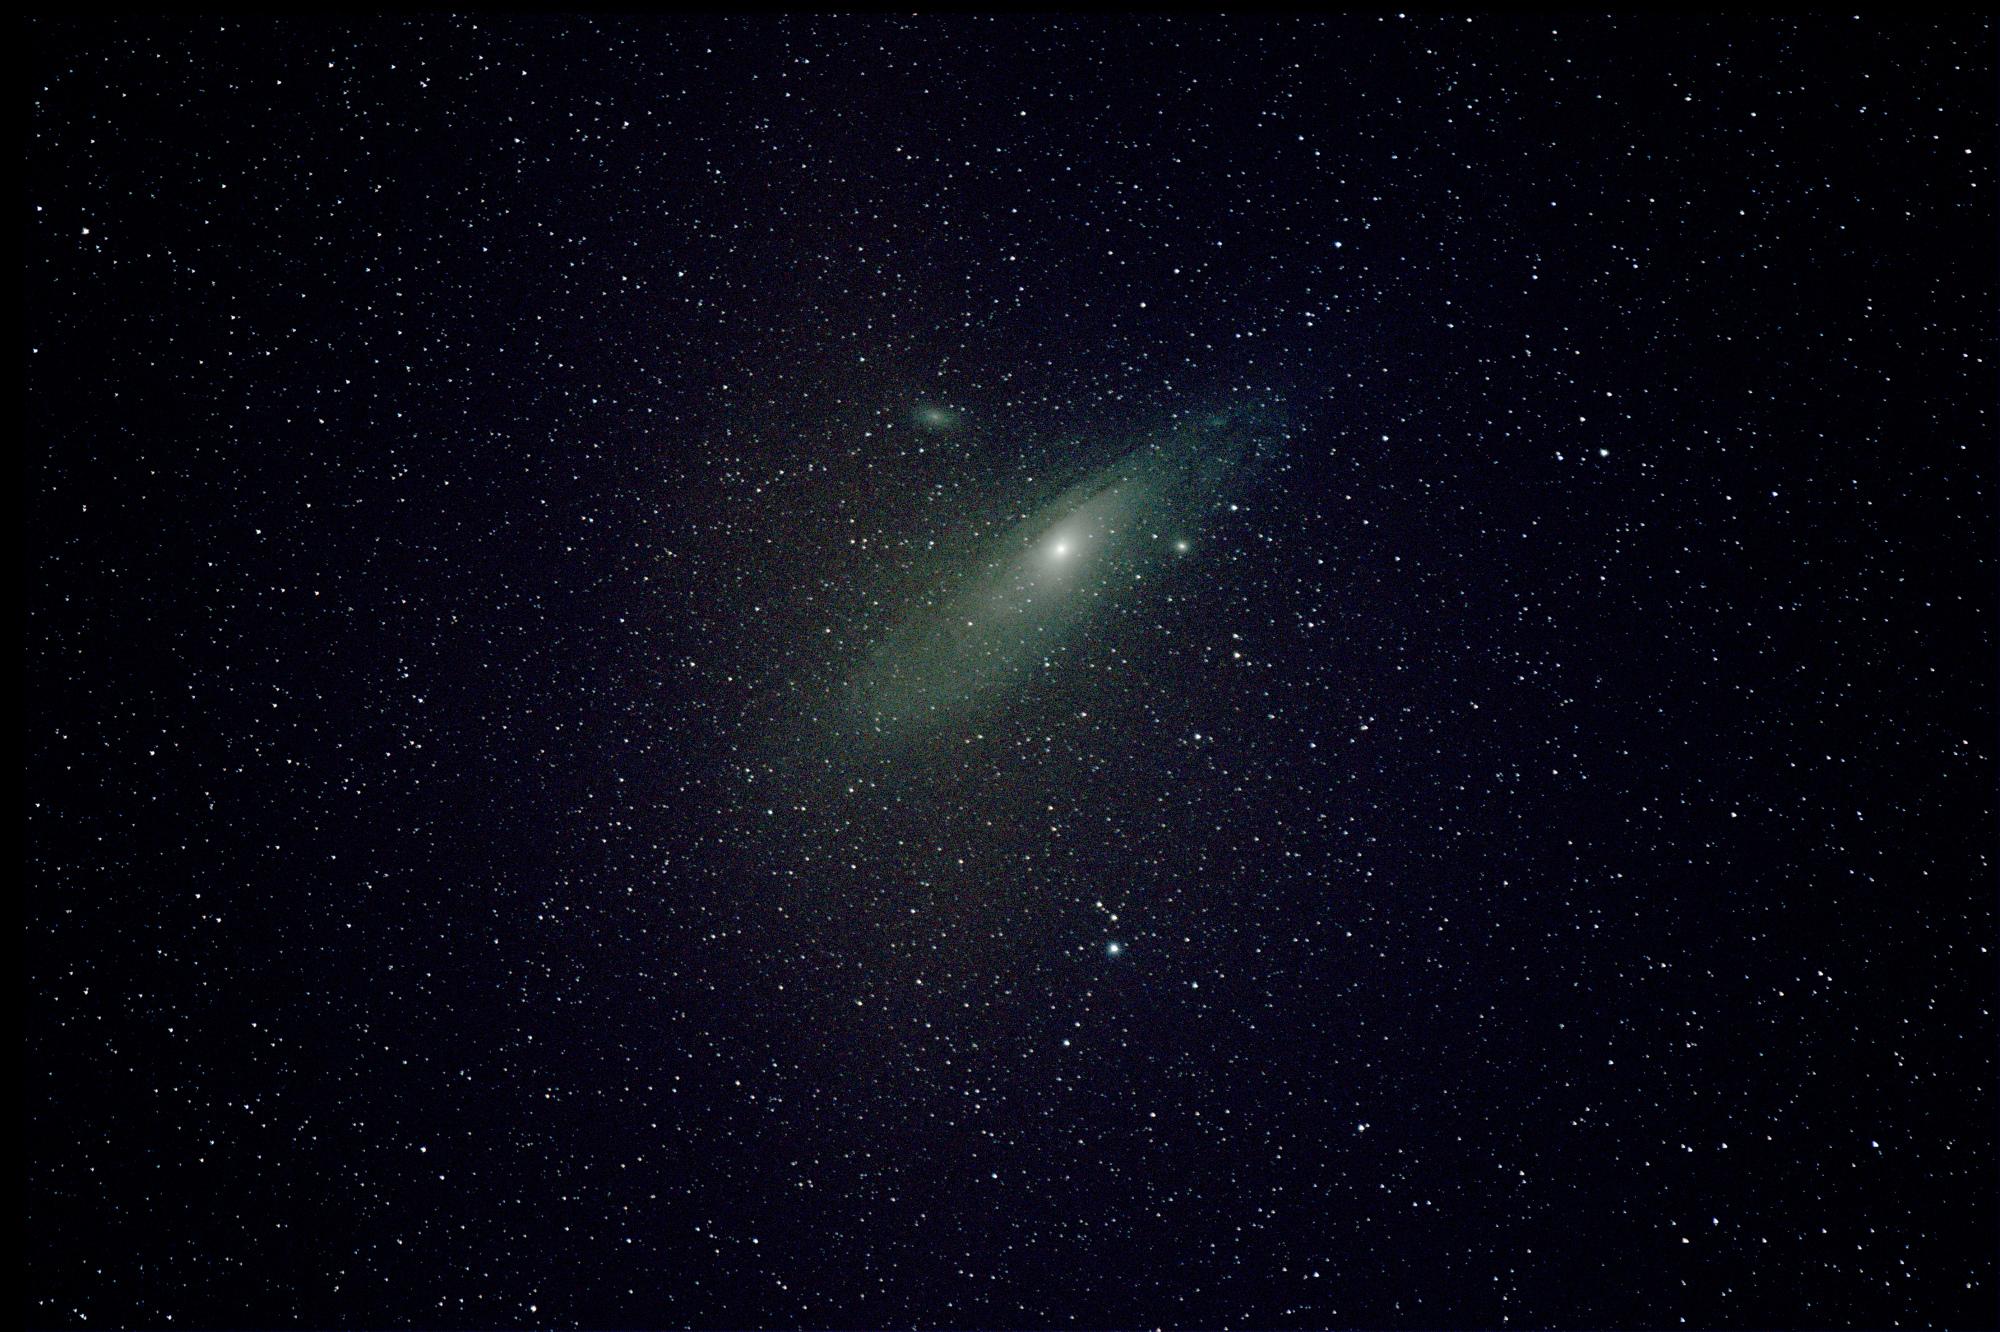 M31_2..thumb.jpg.8a2c1649cfb2c844dc868dacb564837a.jpg